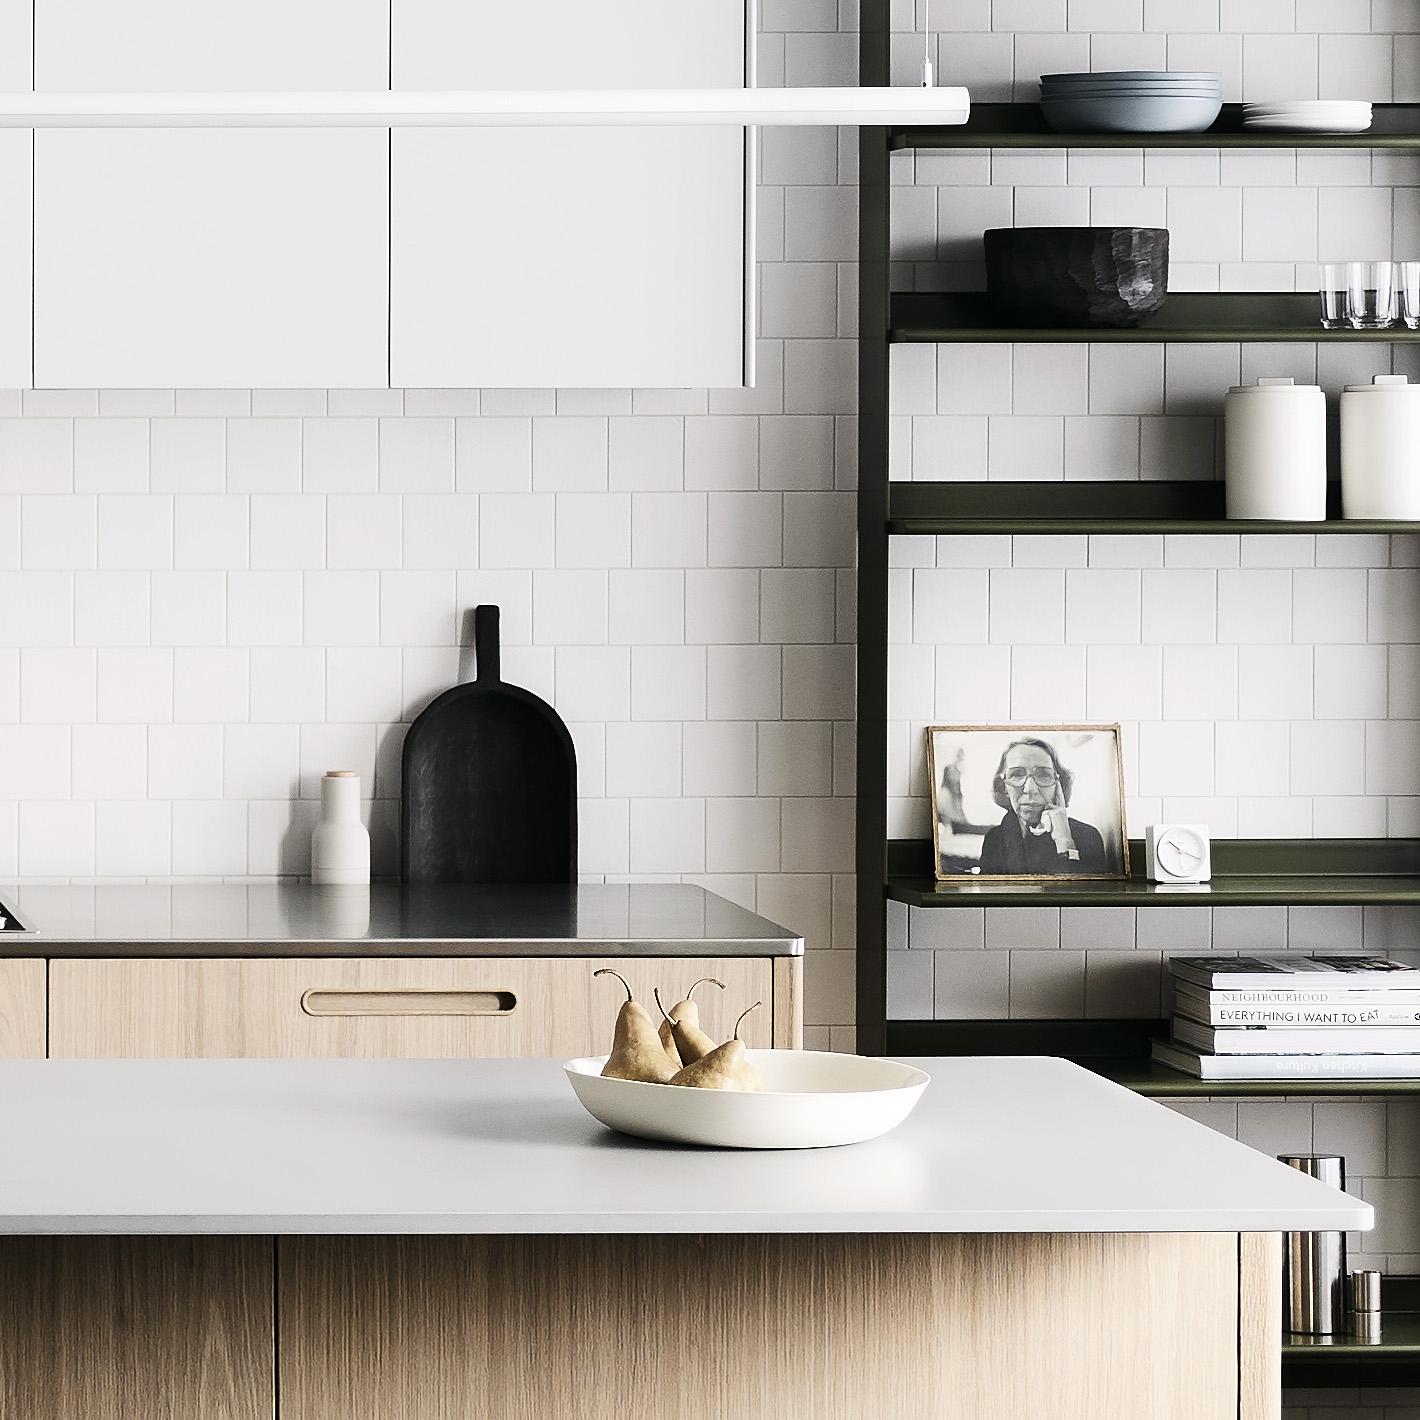 Tableau Cantilever DesignOffice Kitchen System Australia (2).JPG